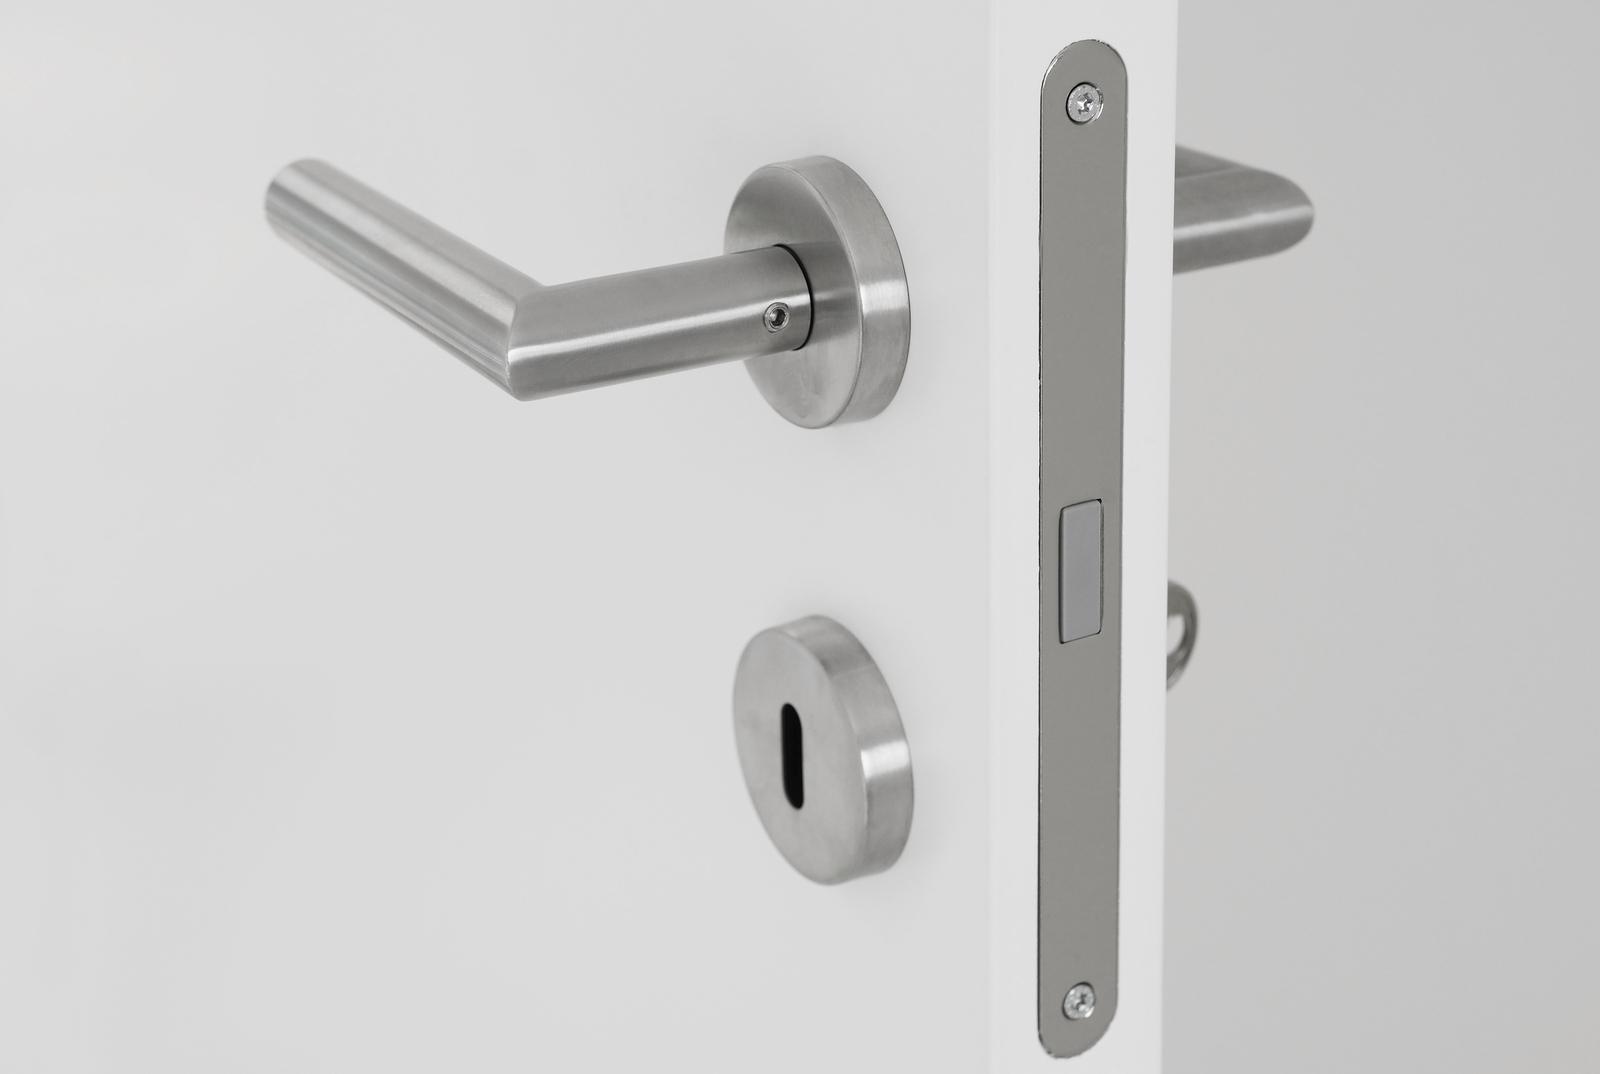 Hardware \u0026 Accessories & Suppliers \u2013 Building Guide \u2013 house design and building tips ... Pezcame.Com